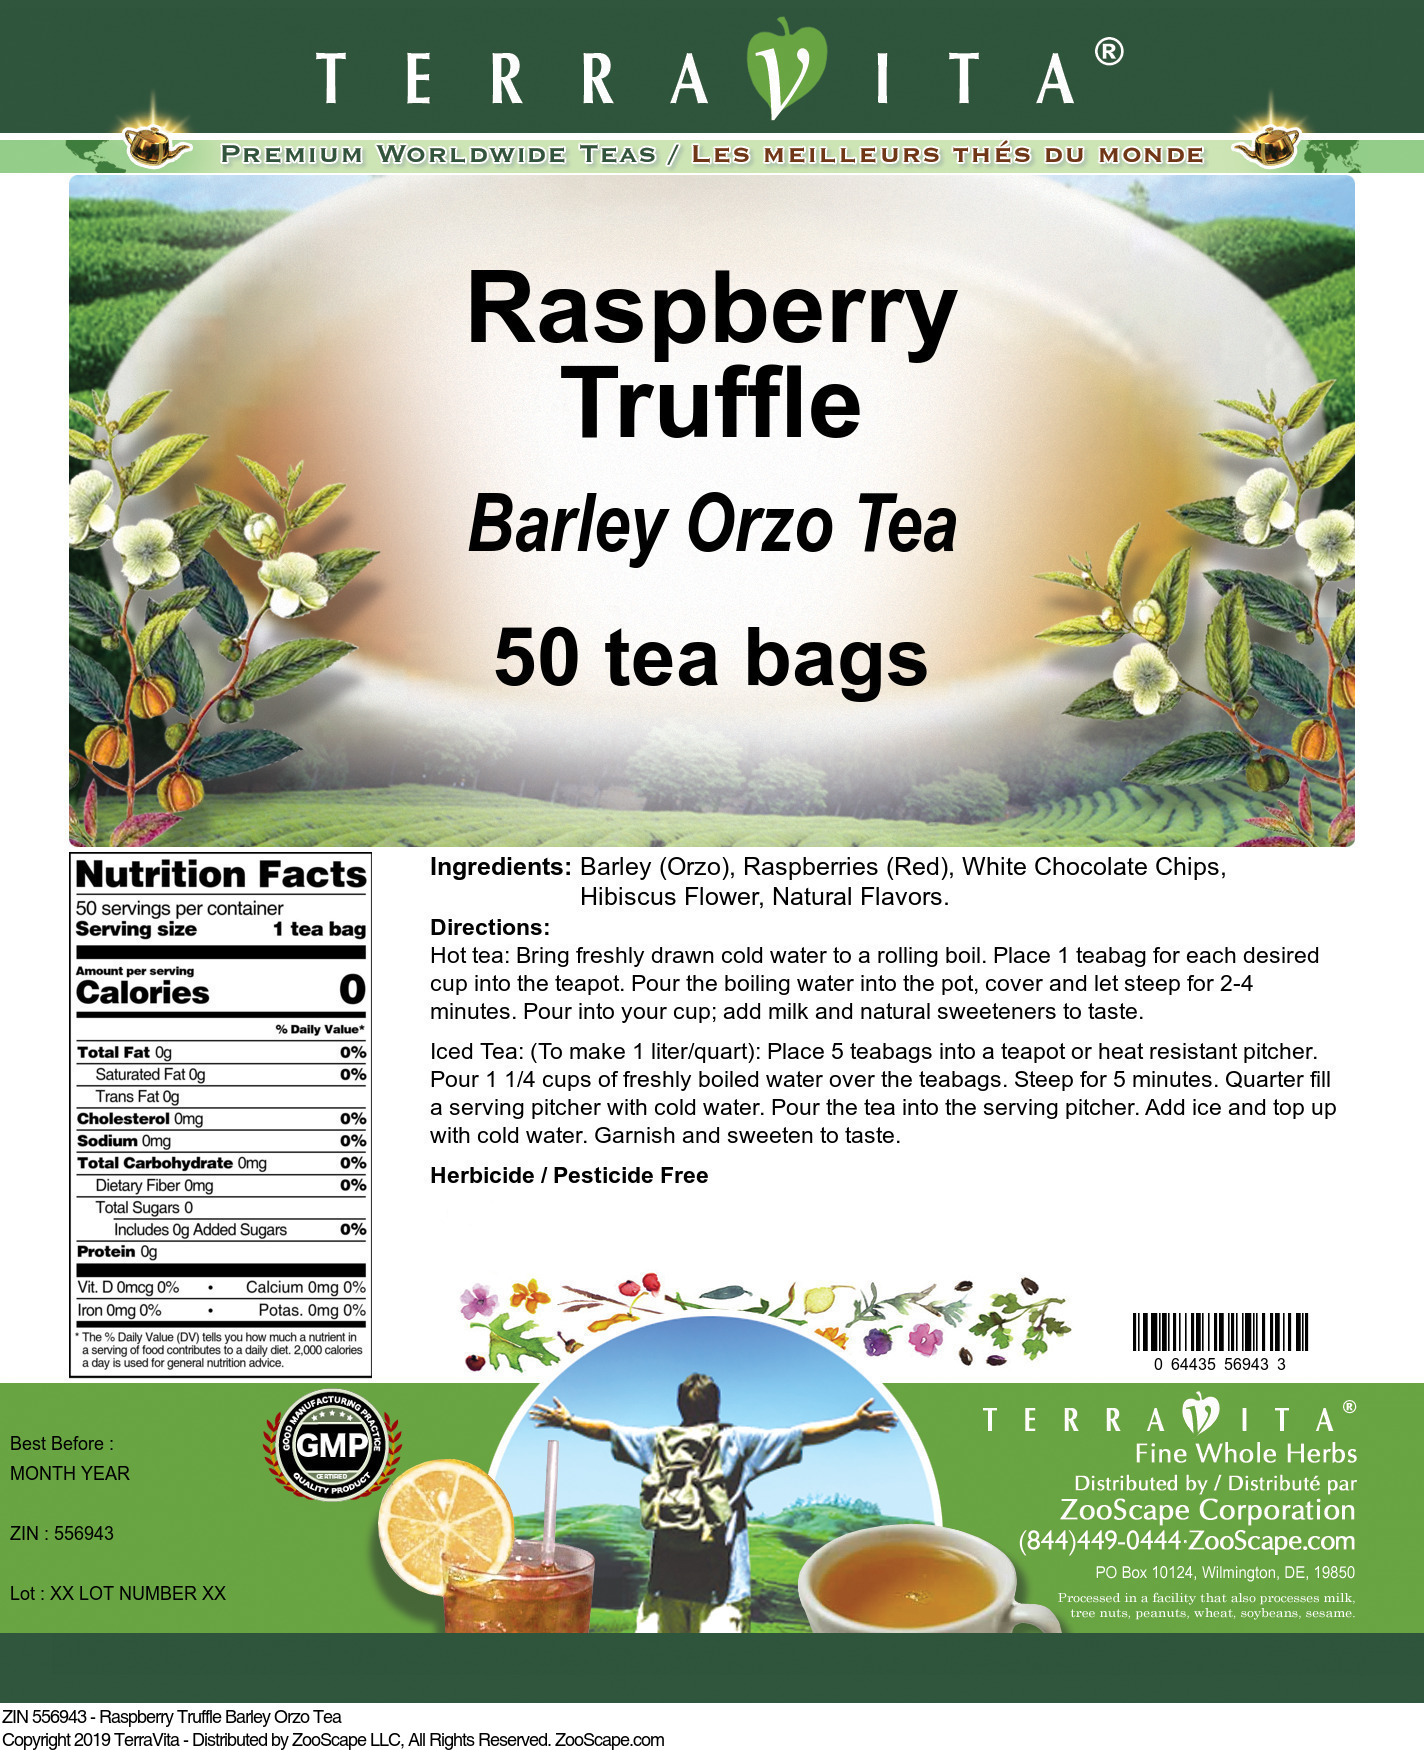 Raspberry Truffle Barley Orzo Tea